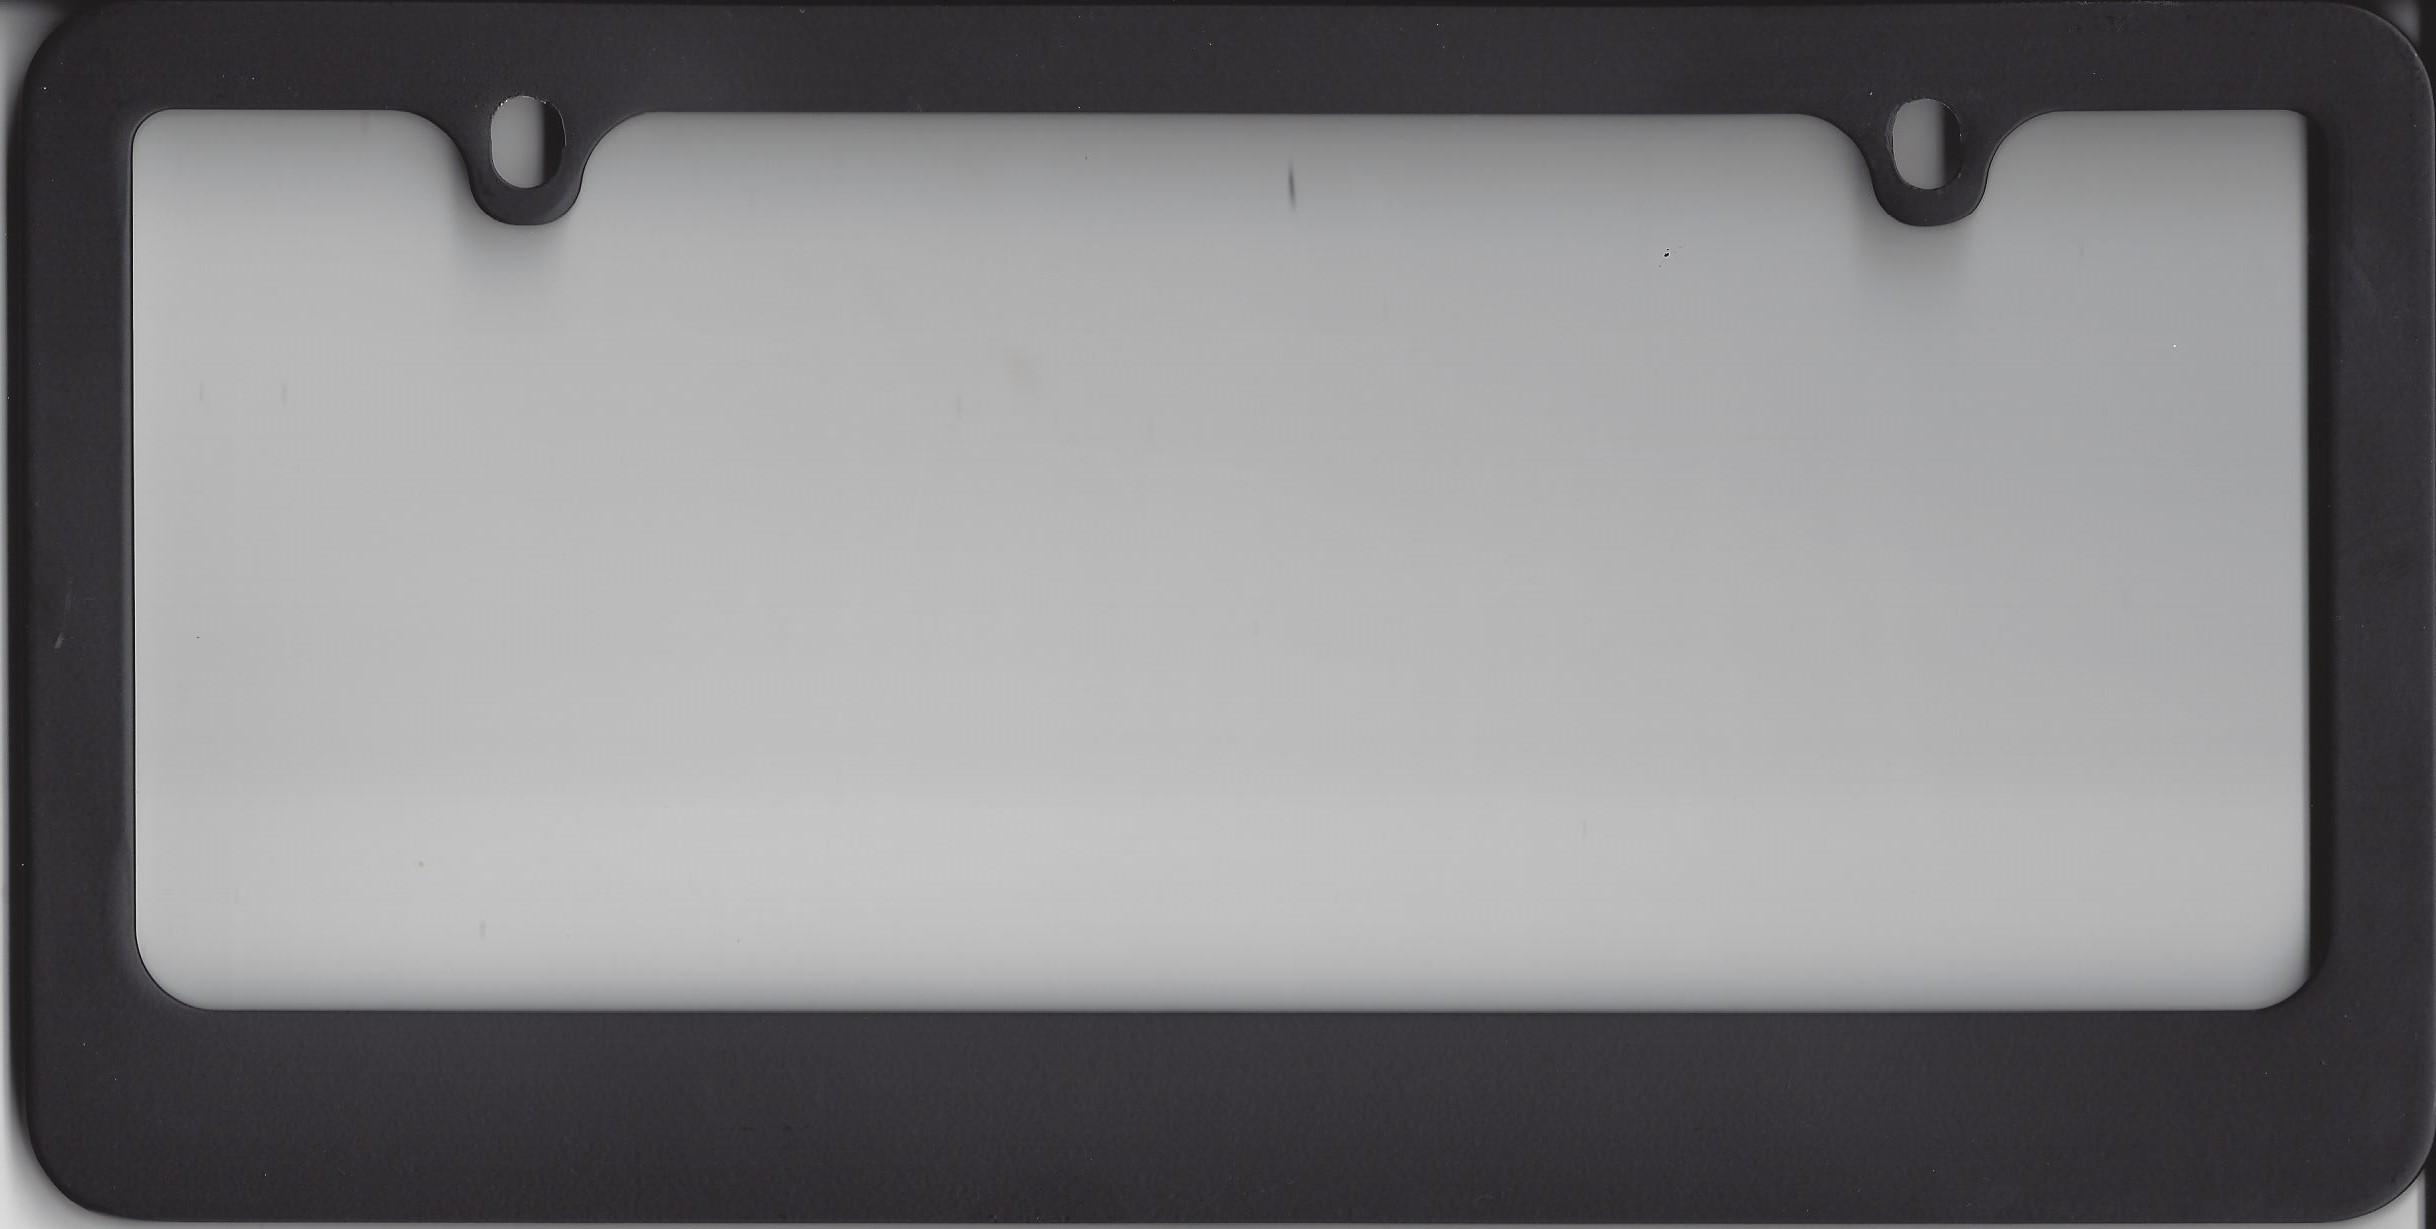 Blank Smooth Heavy Duty Black 2-Hole License Plate Frame Blank ...